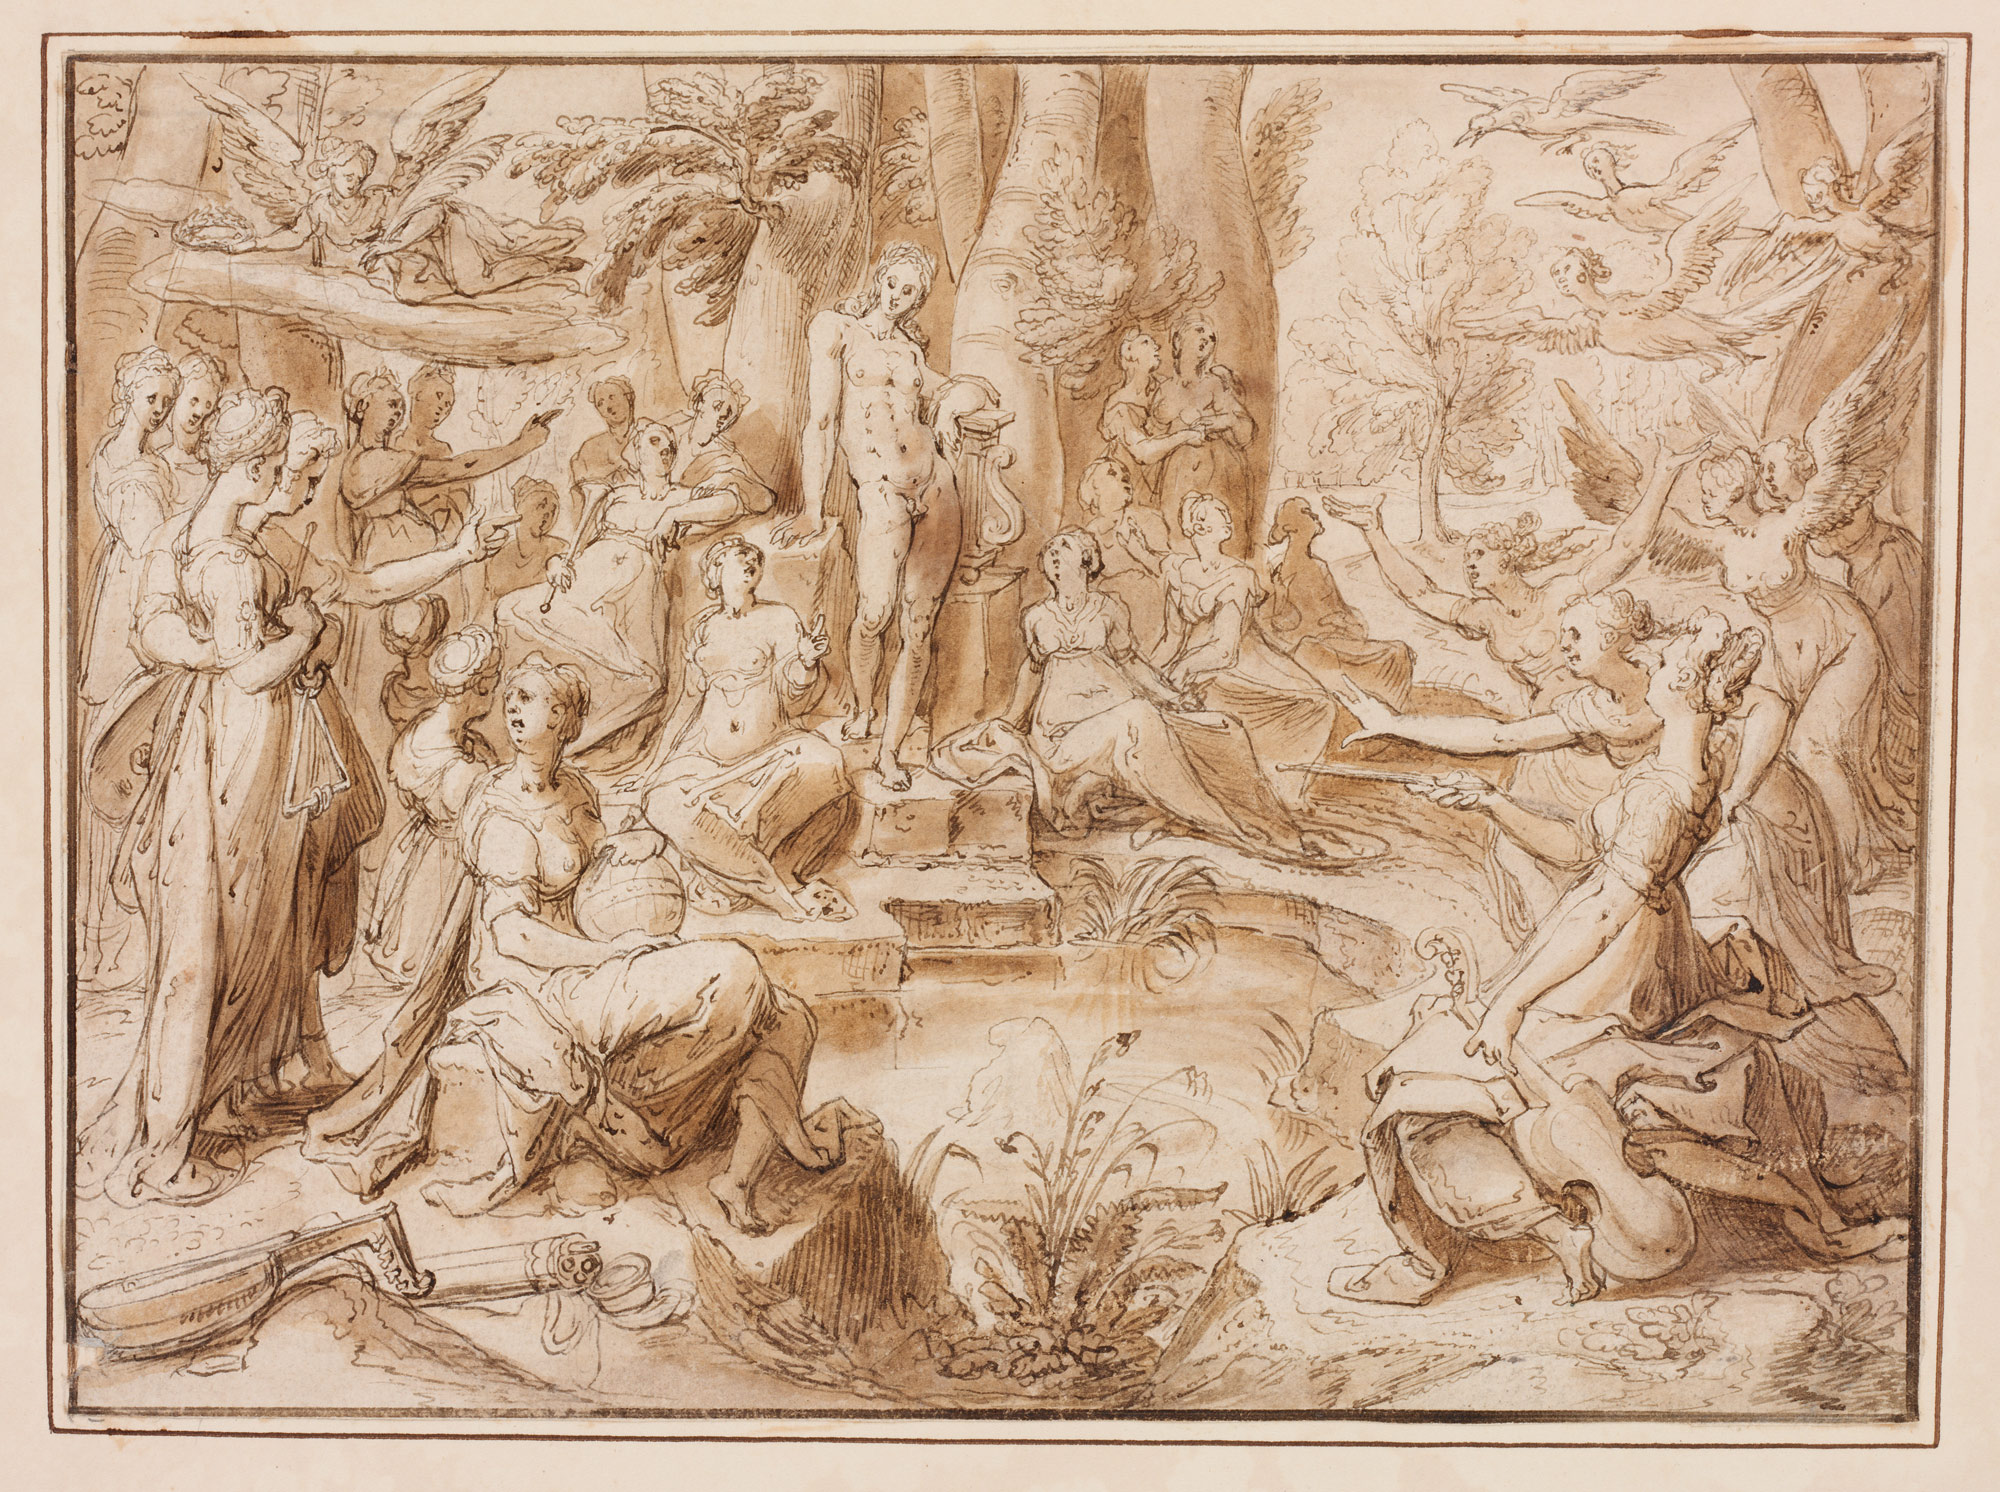 the challenge of the pierides from ovids metamorphosis book v 294 678 - Ovid Lebenslauf